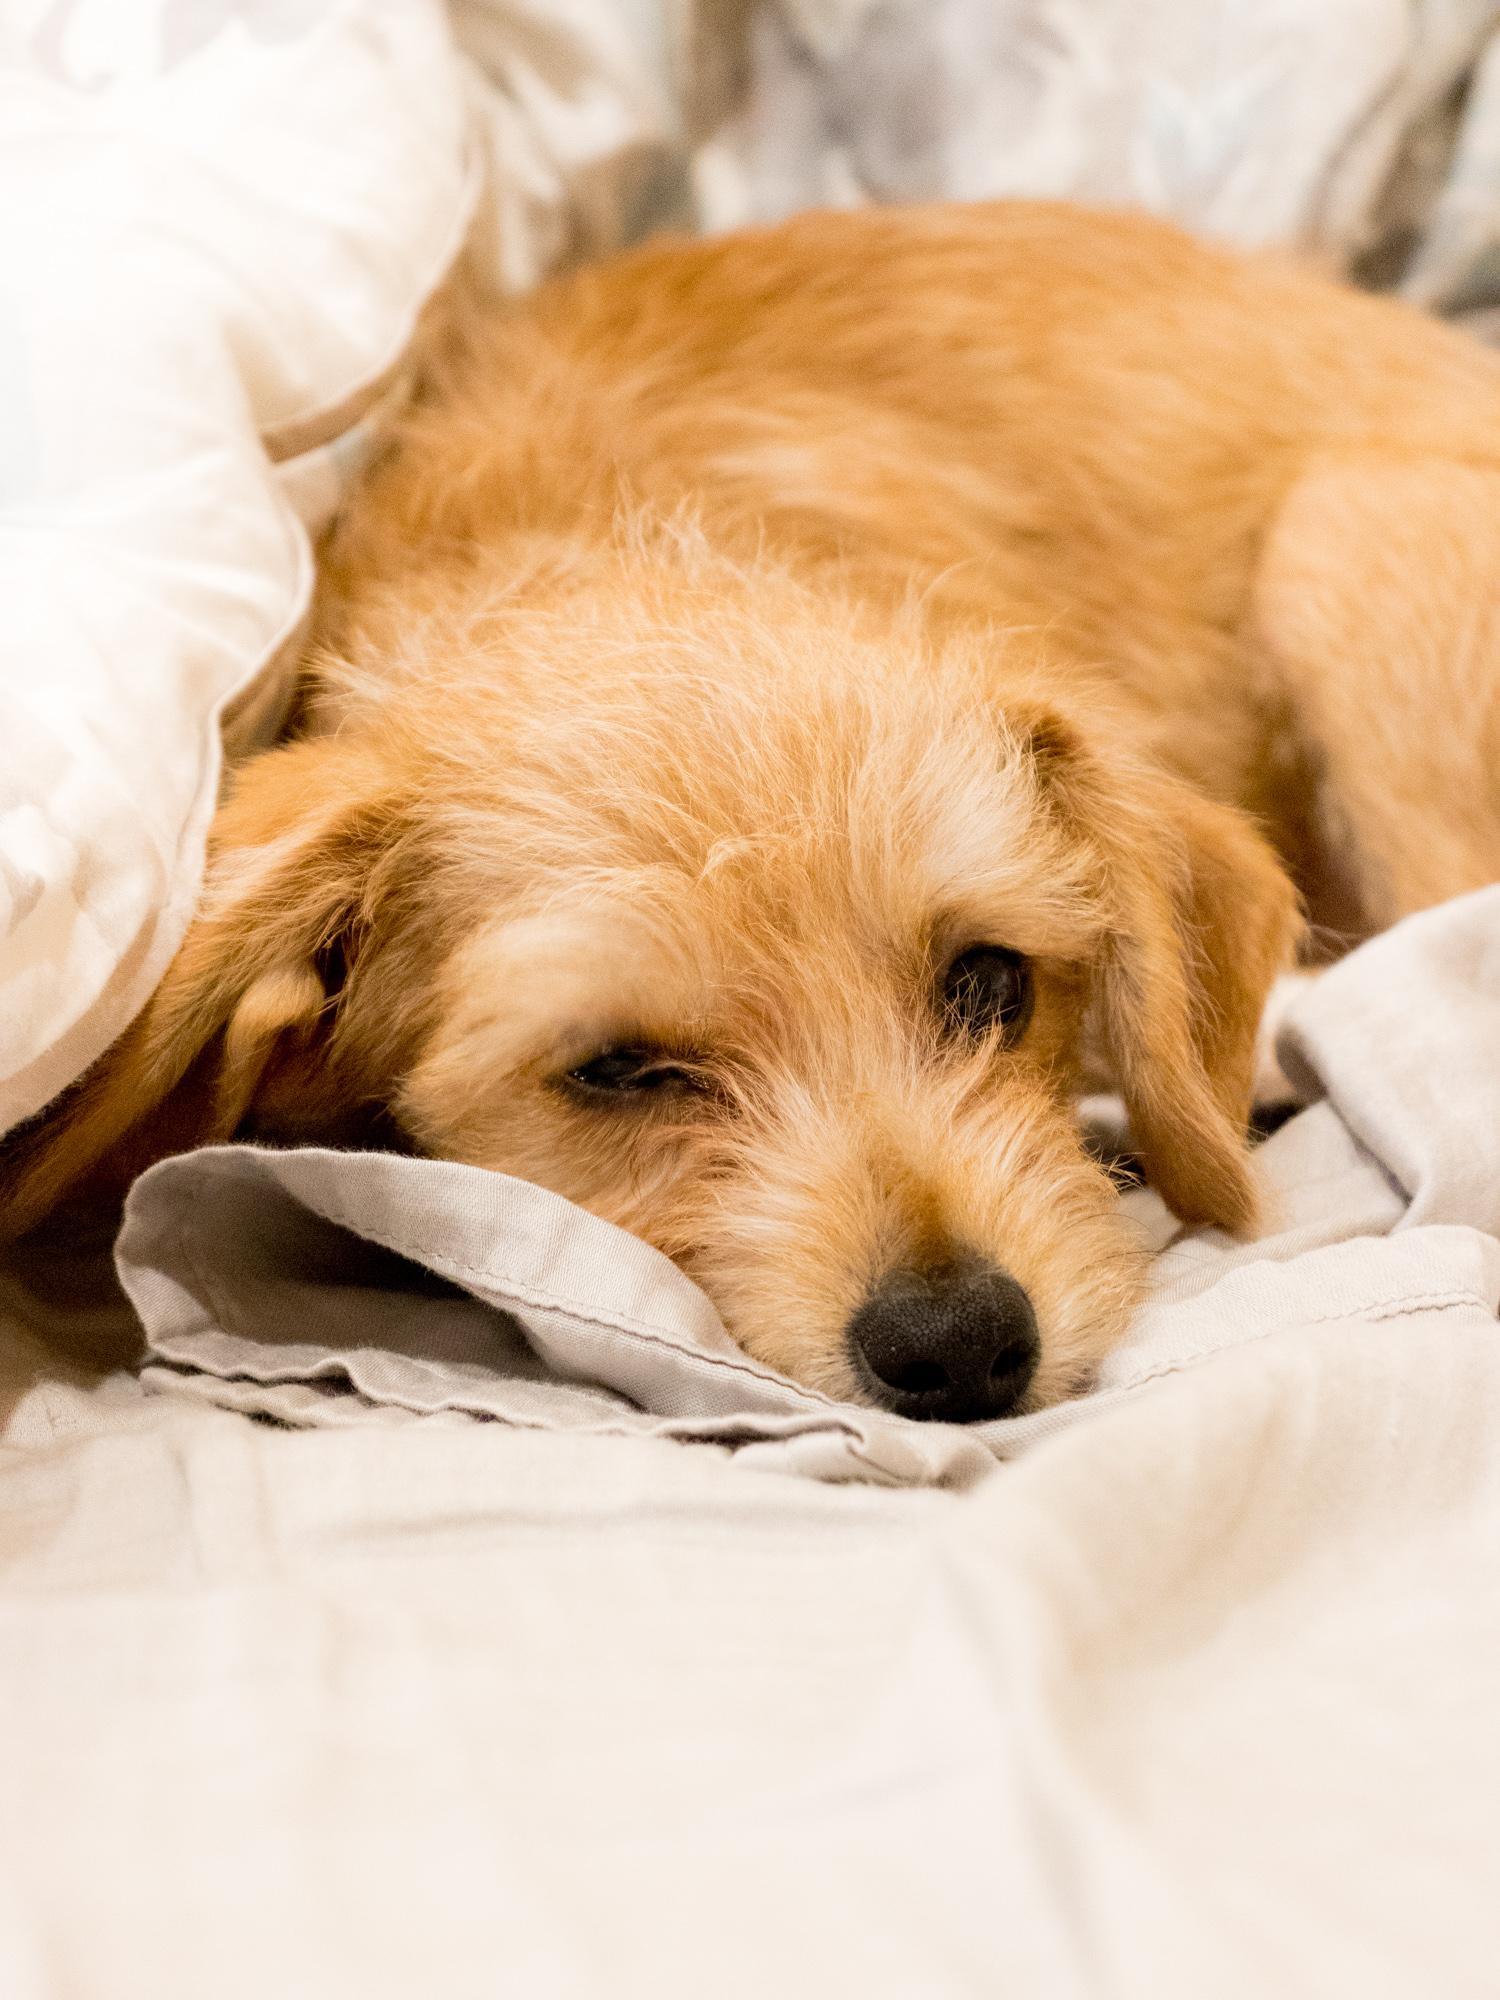 Goodnight Peanut the Puppy